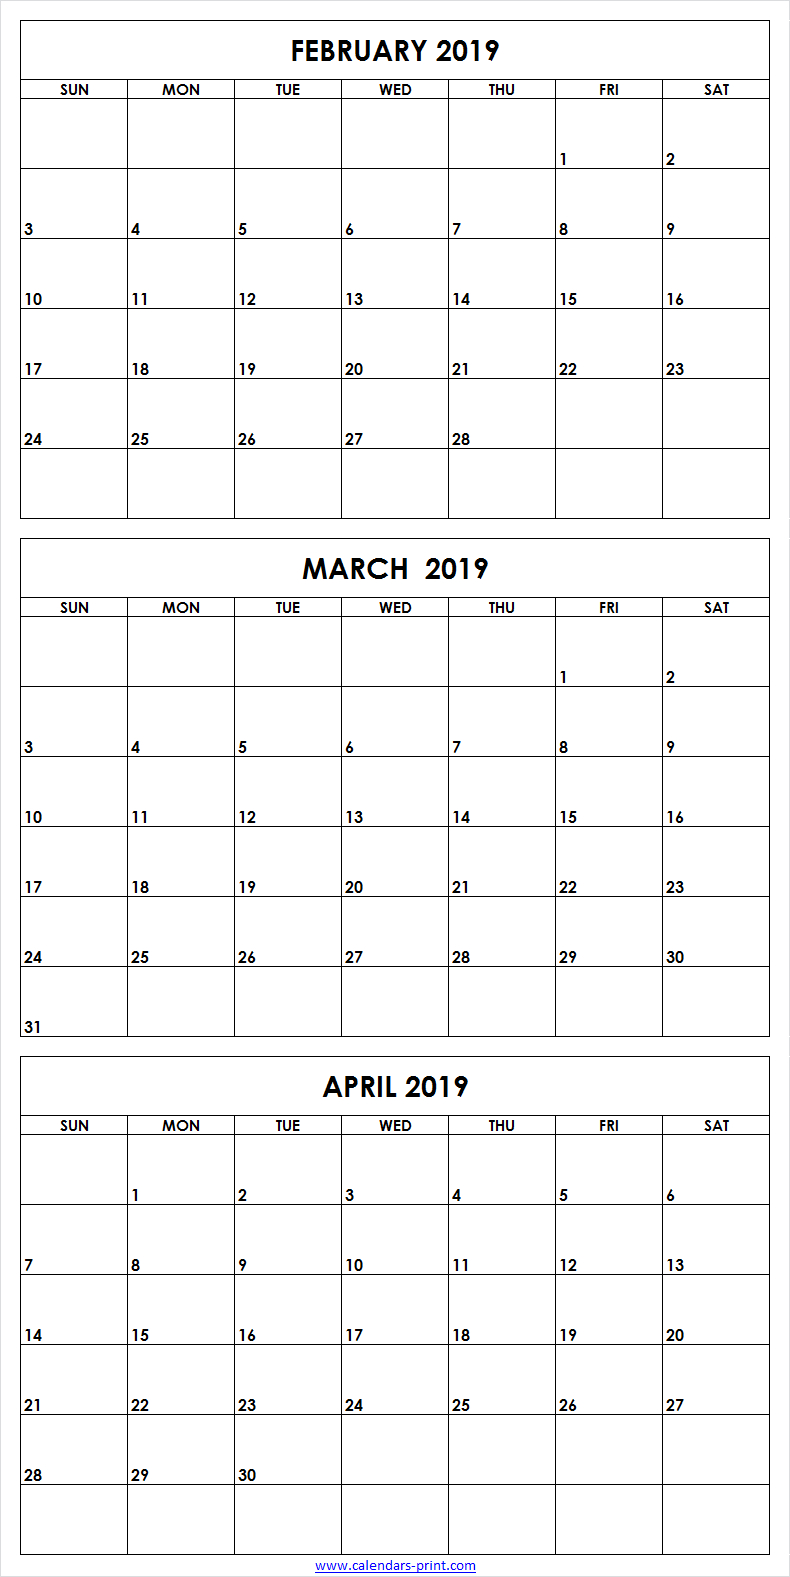 3 Month February To April 2019 Calendar Template   February 2019 3 Month Calendar 2019